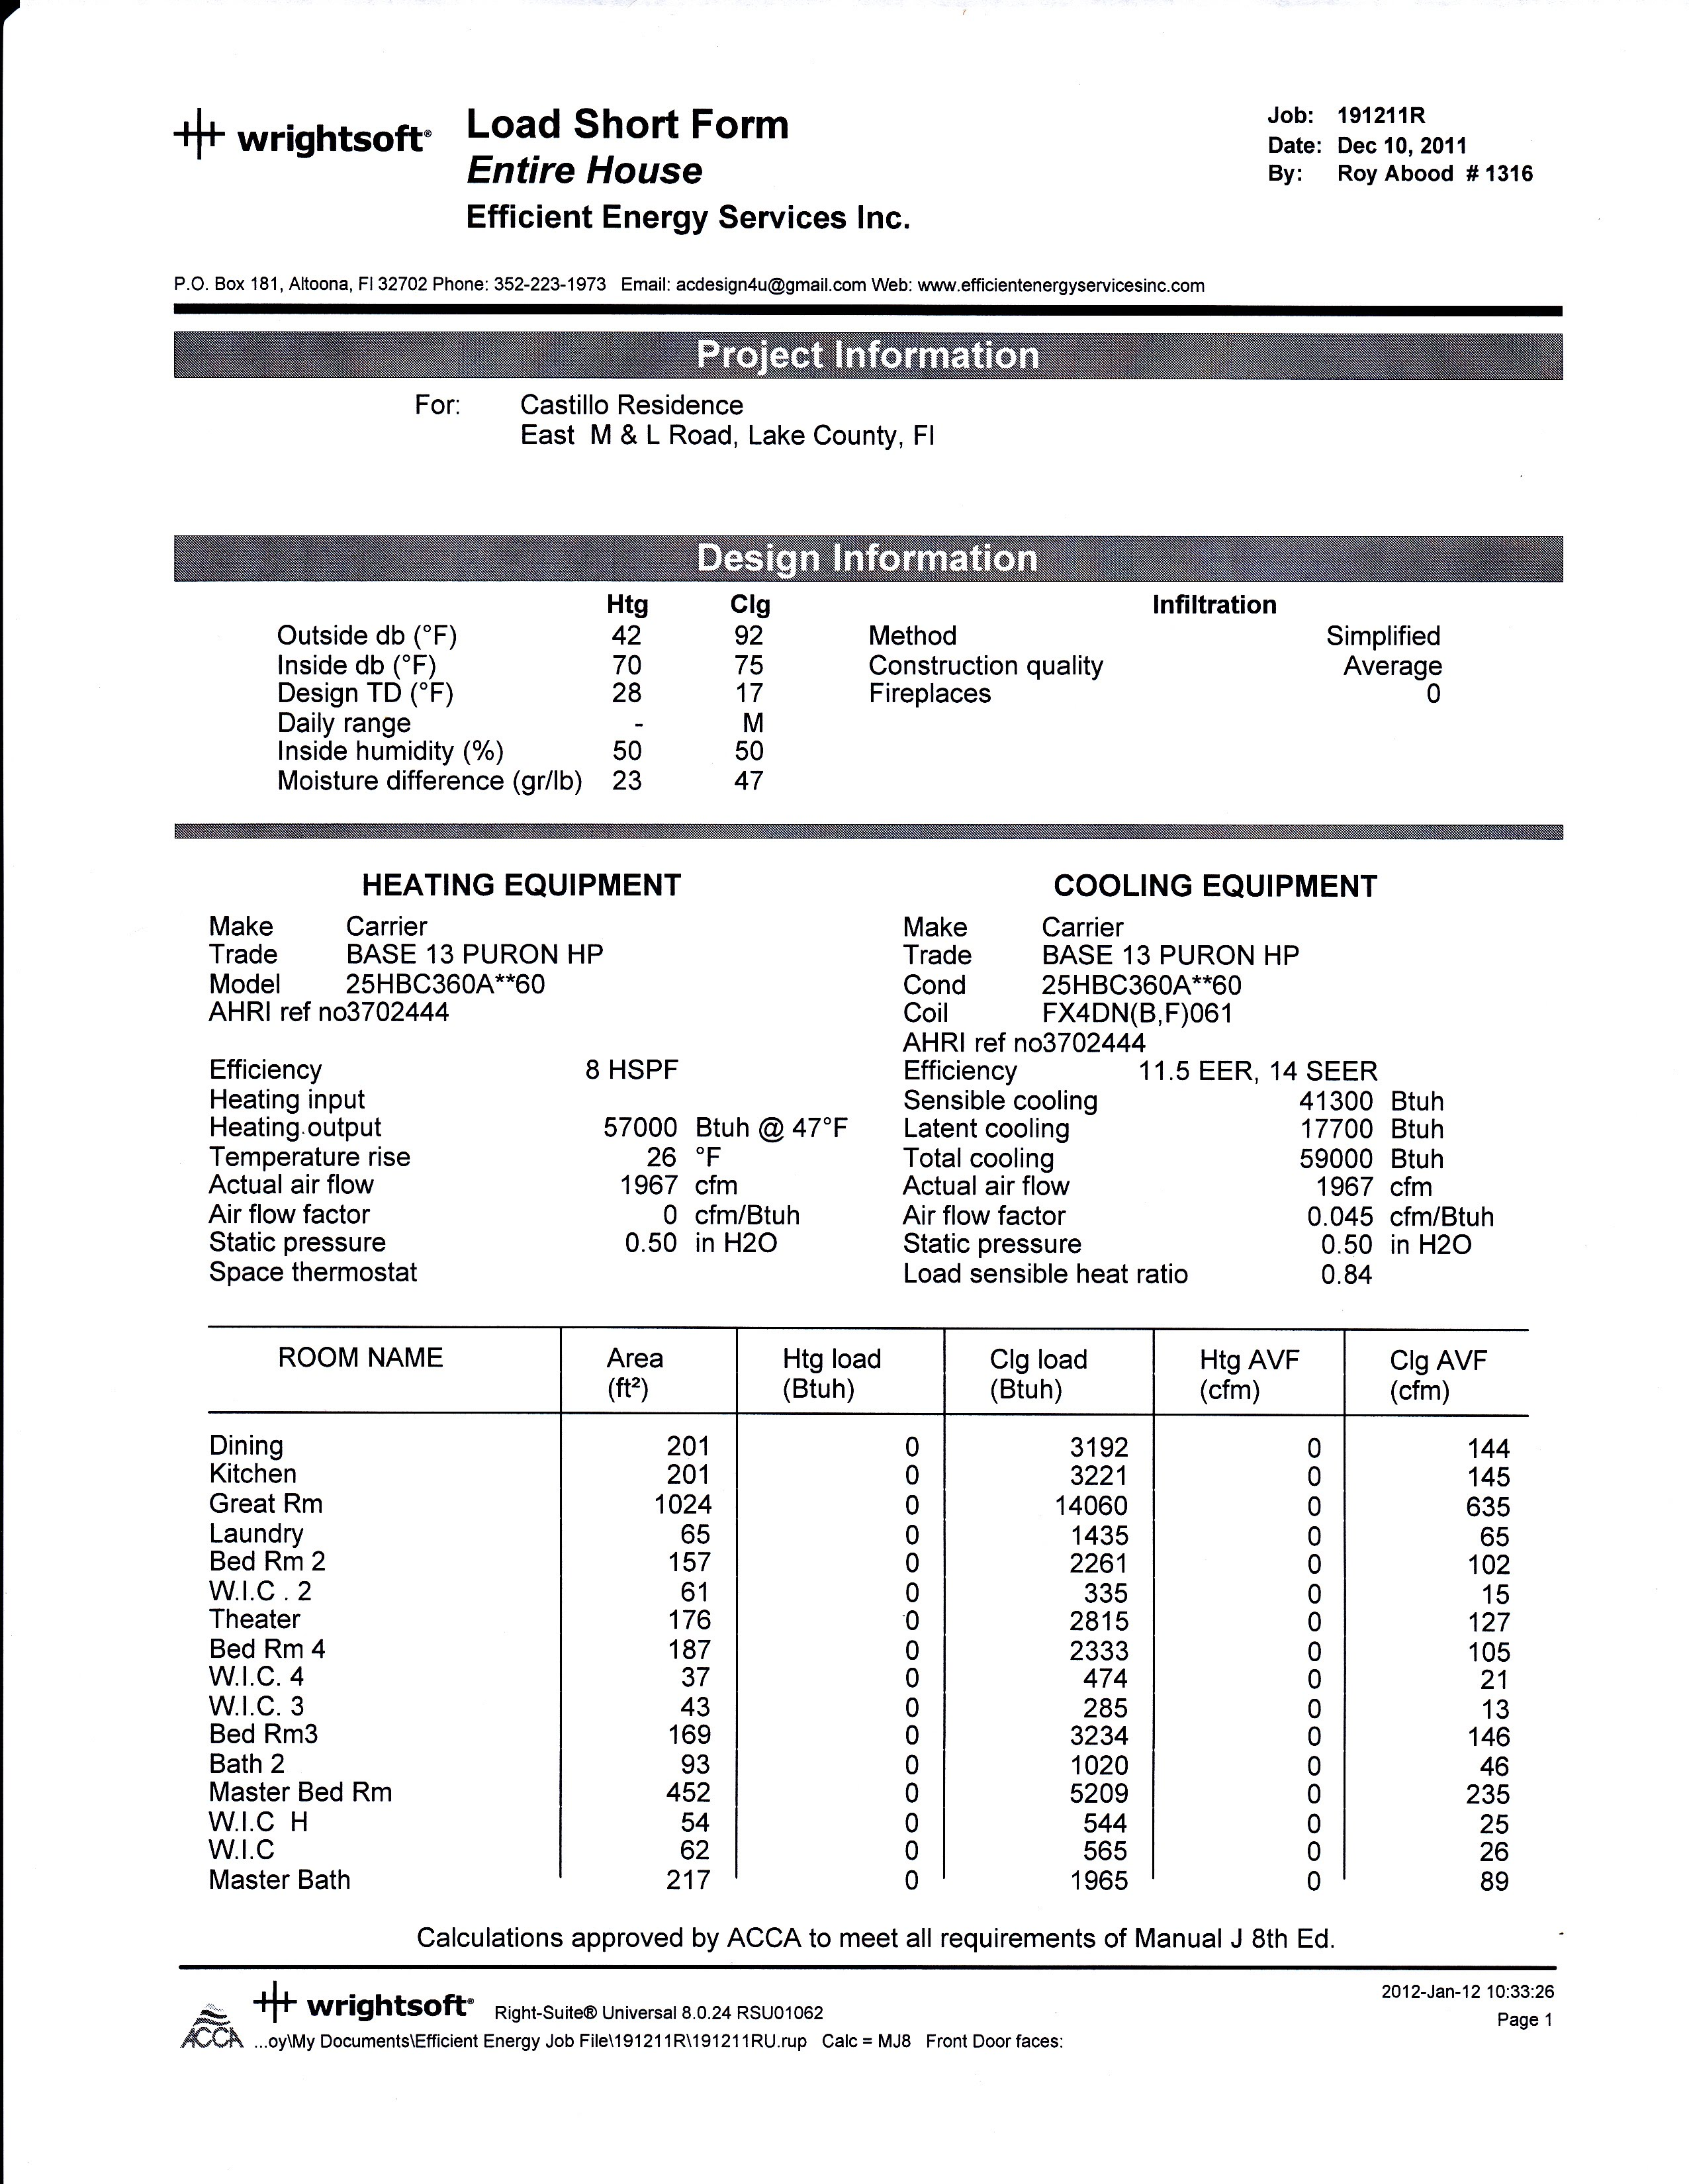 Cooling Loads Manual J - Efficient Energy Services Inc.352-669 ...